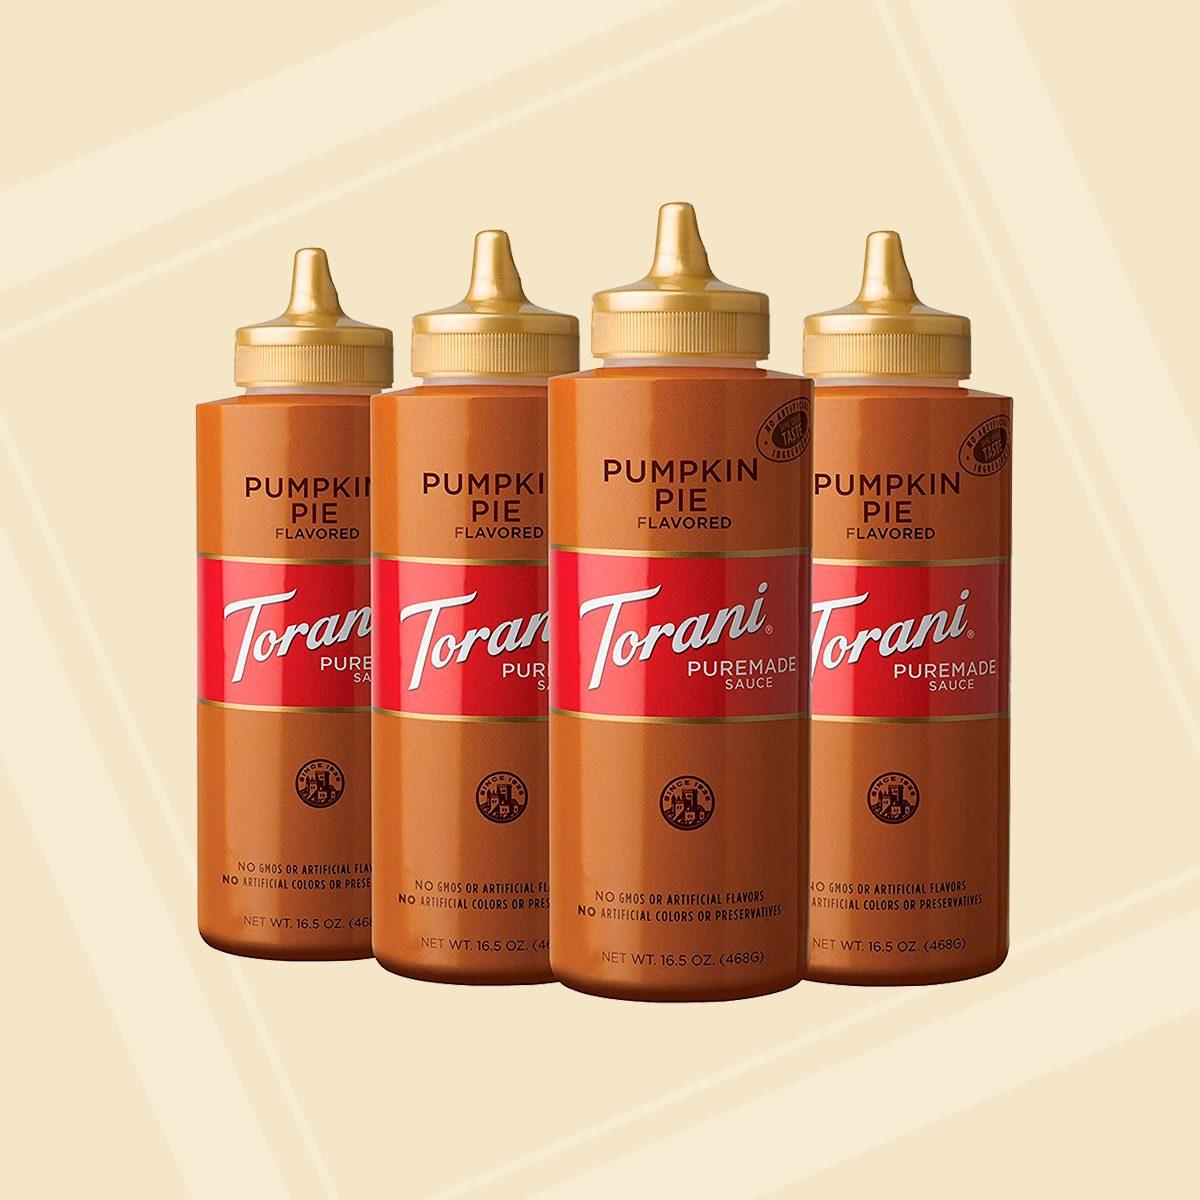 Torani Puremade Pumpkin Pie Sauce, 16.5 Ounce (Pack of 4) square crop